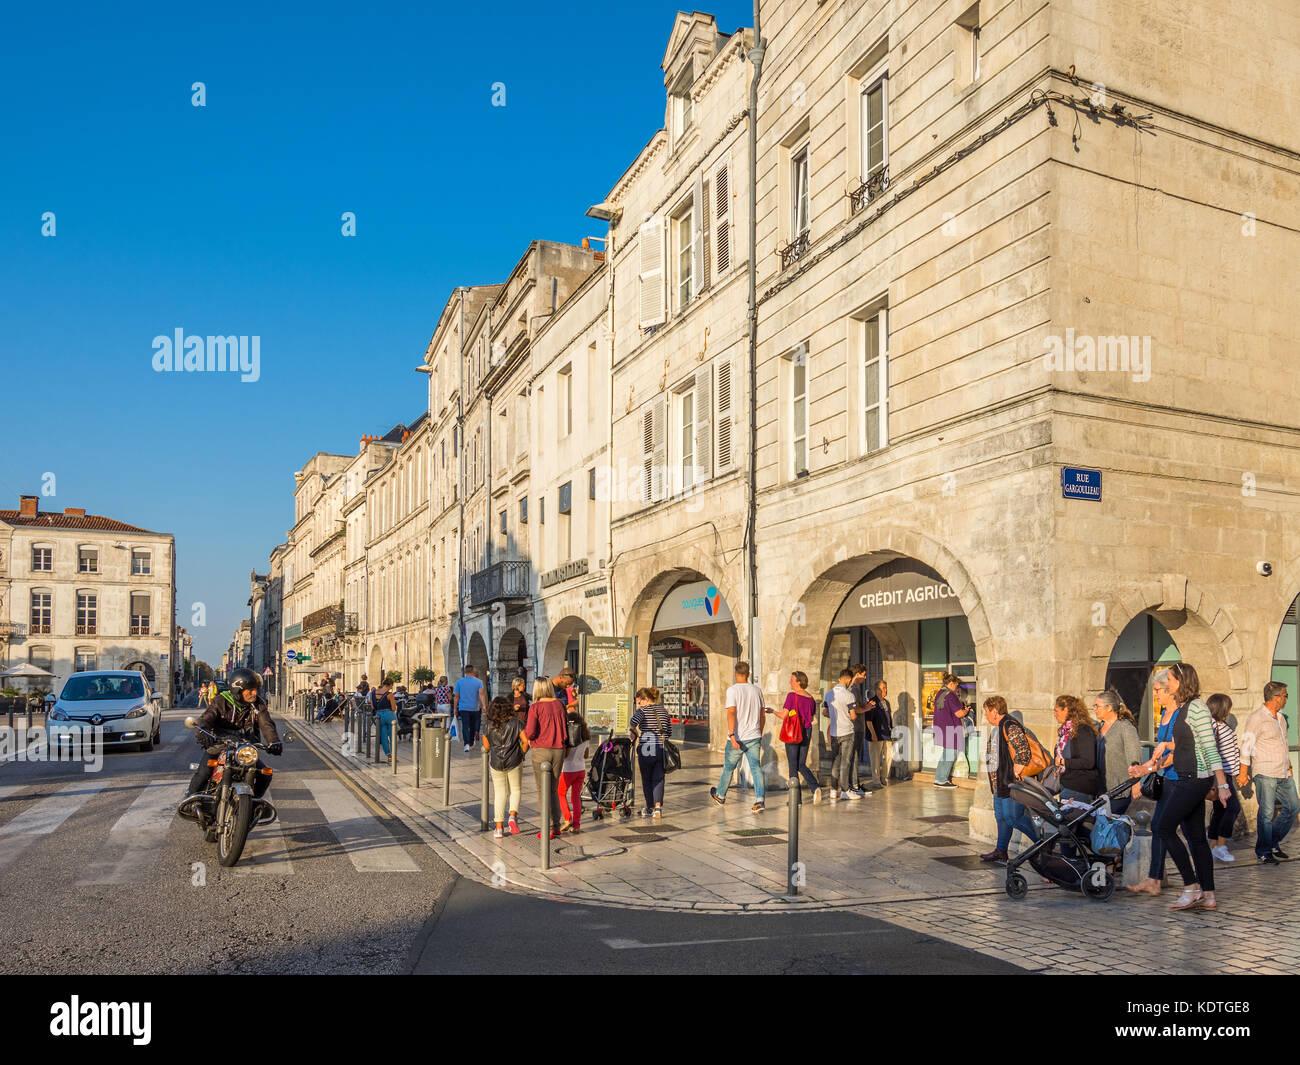 Tourists in shopping arcades, Rue Albert 1er, La Rochelle, France. - Stock Image